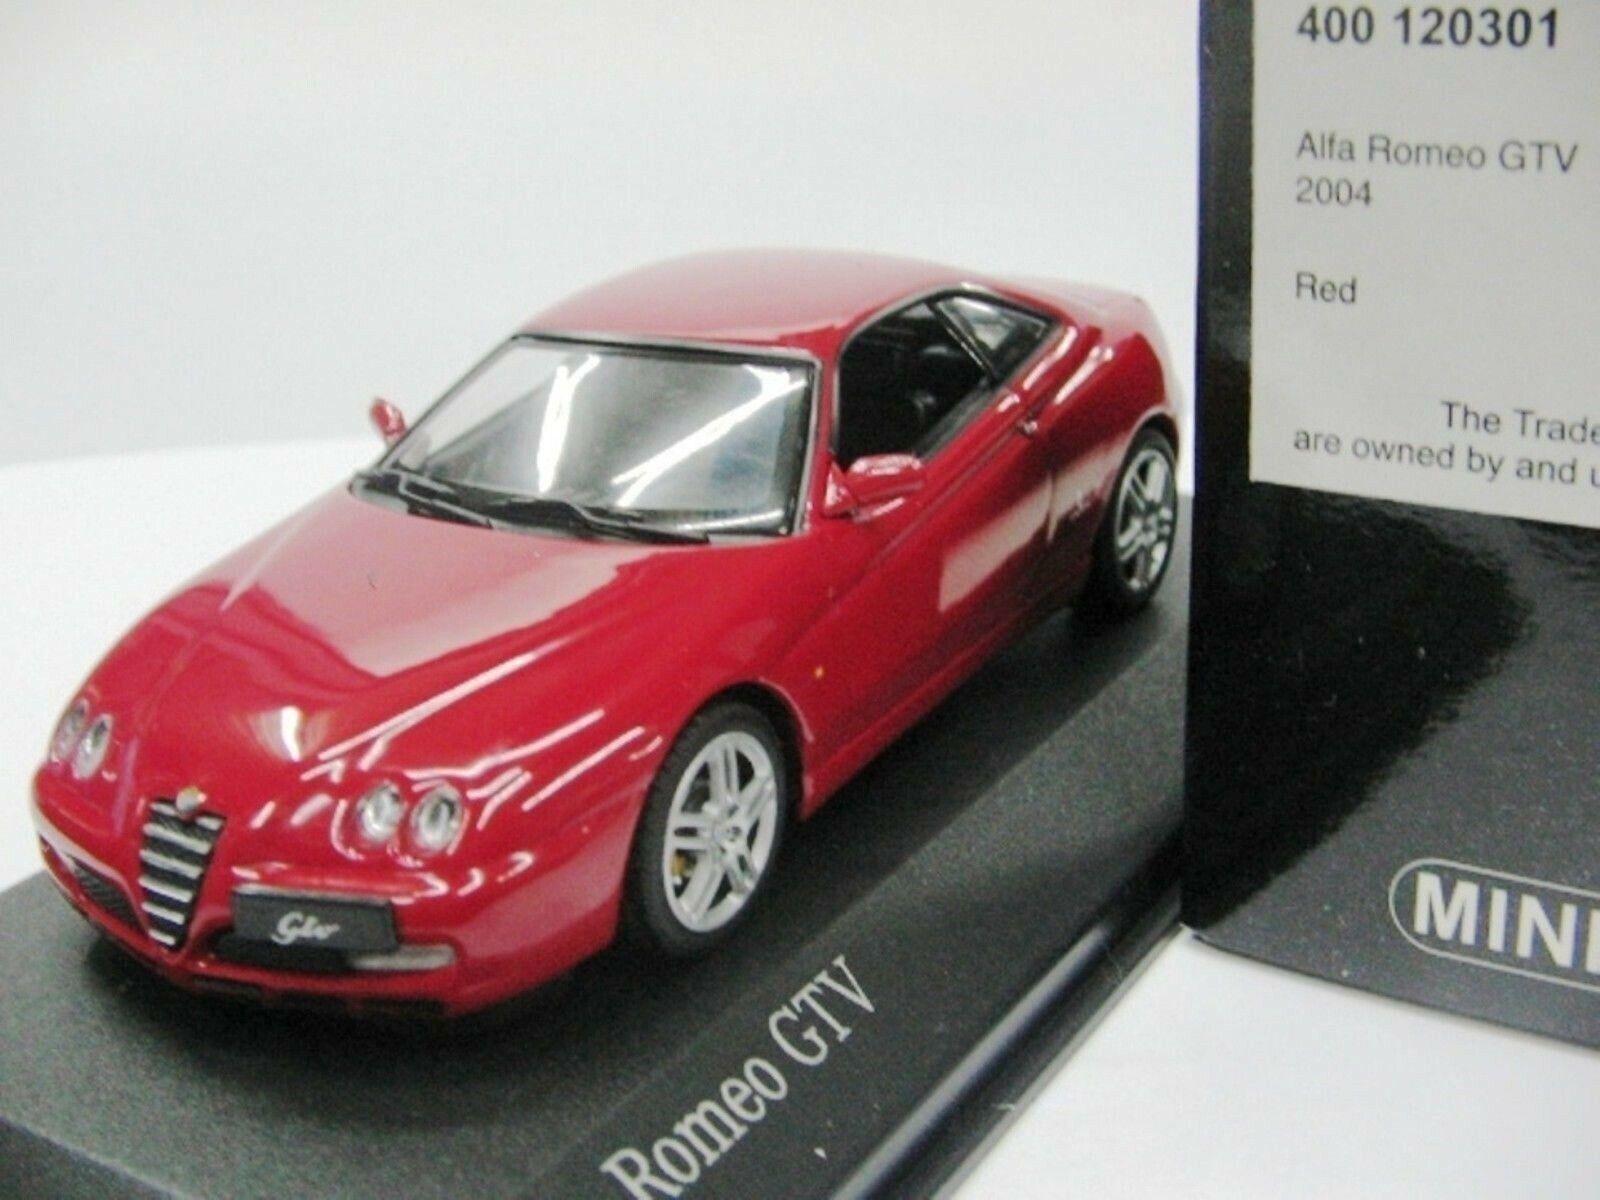 WOW EXTREMELY RARE Alfa Romeo 916C GTV 3.2 V6 24V 2003 Red 1 43 Minichamps-164